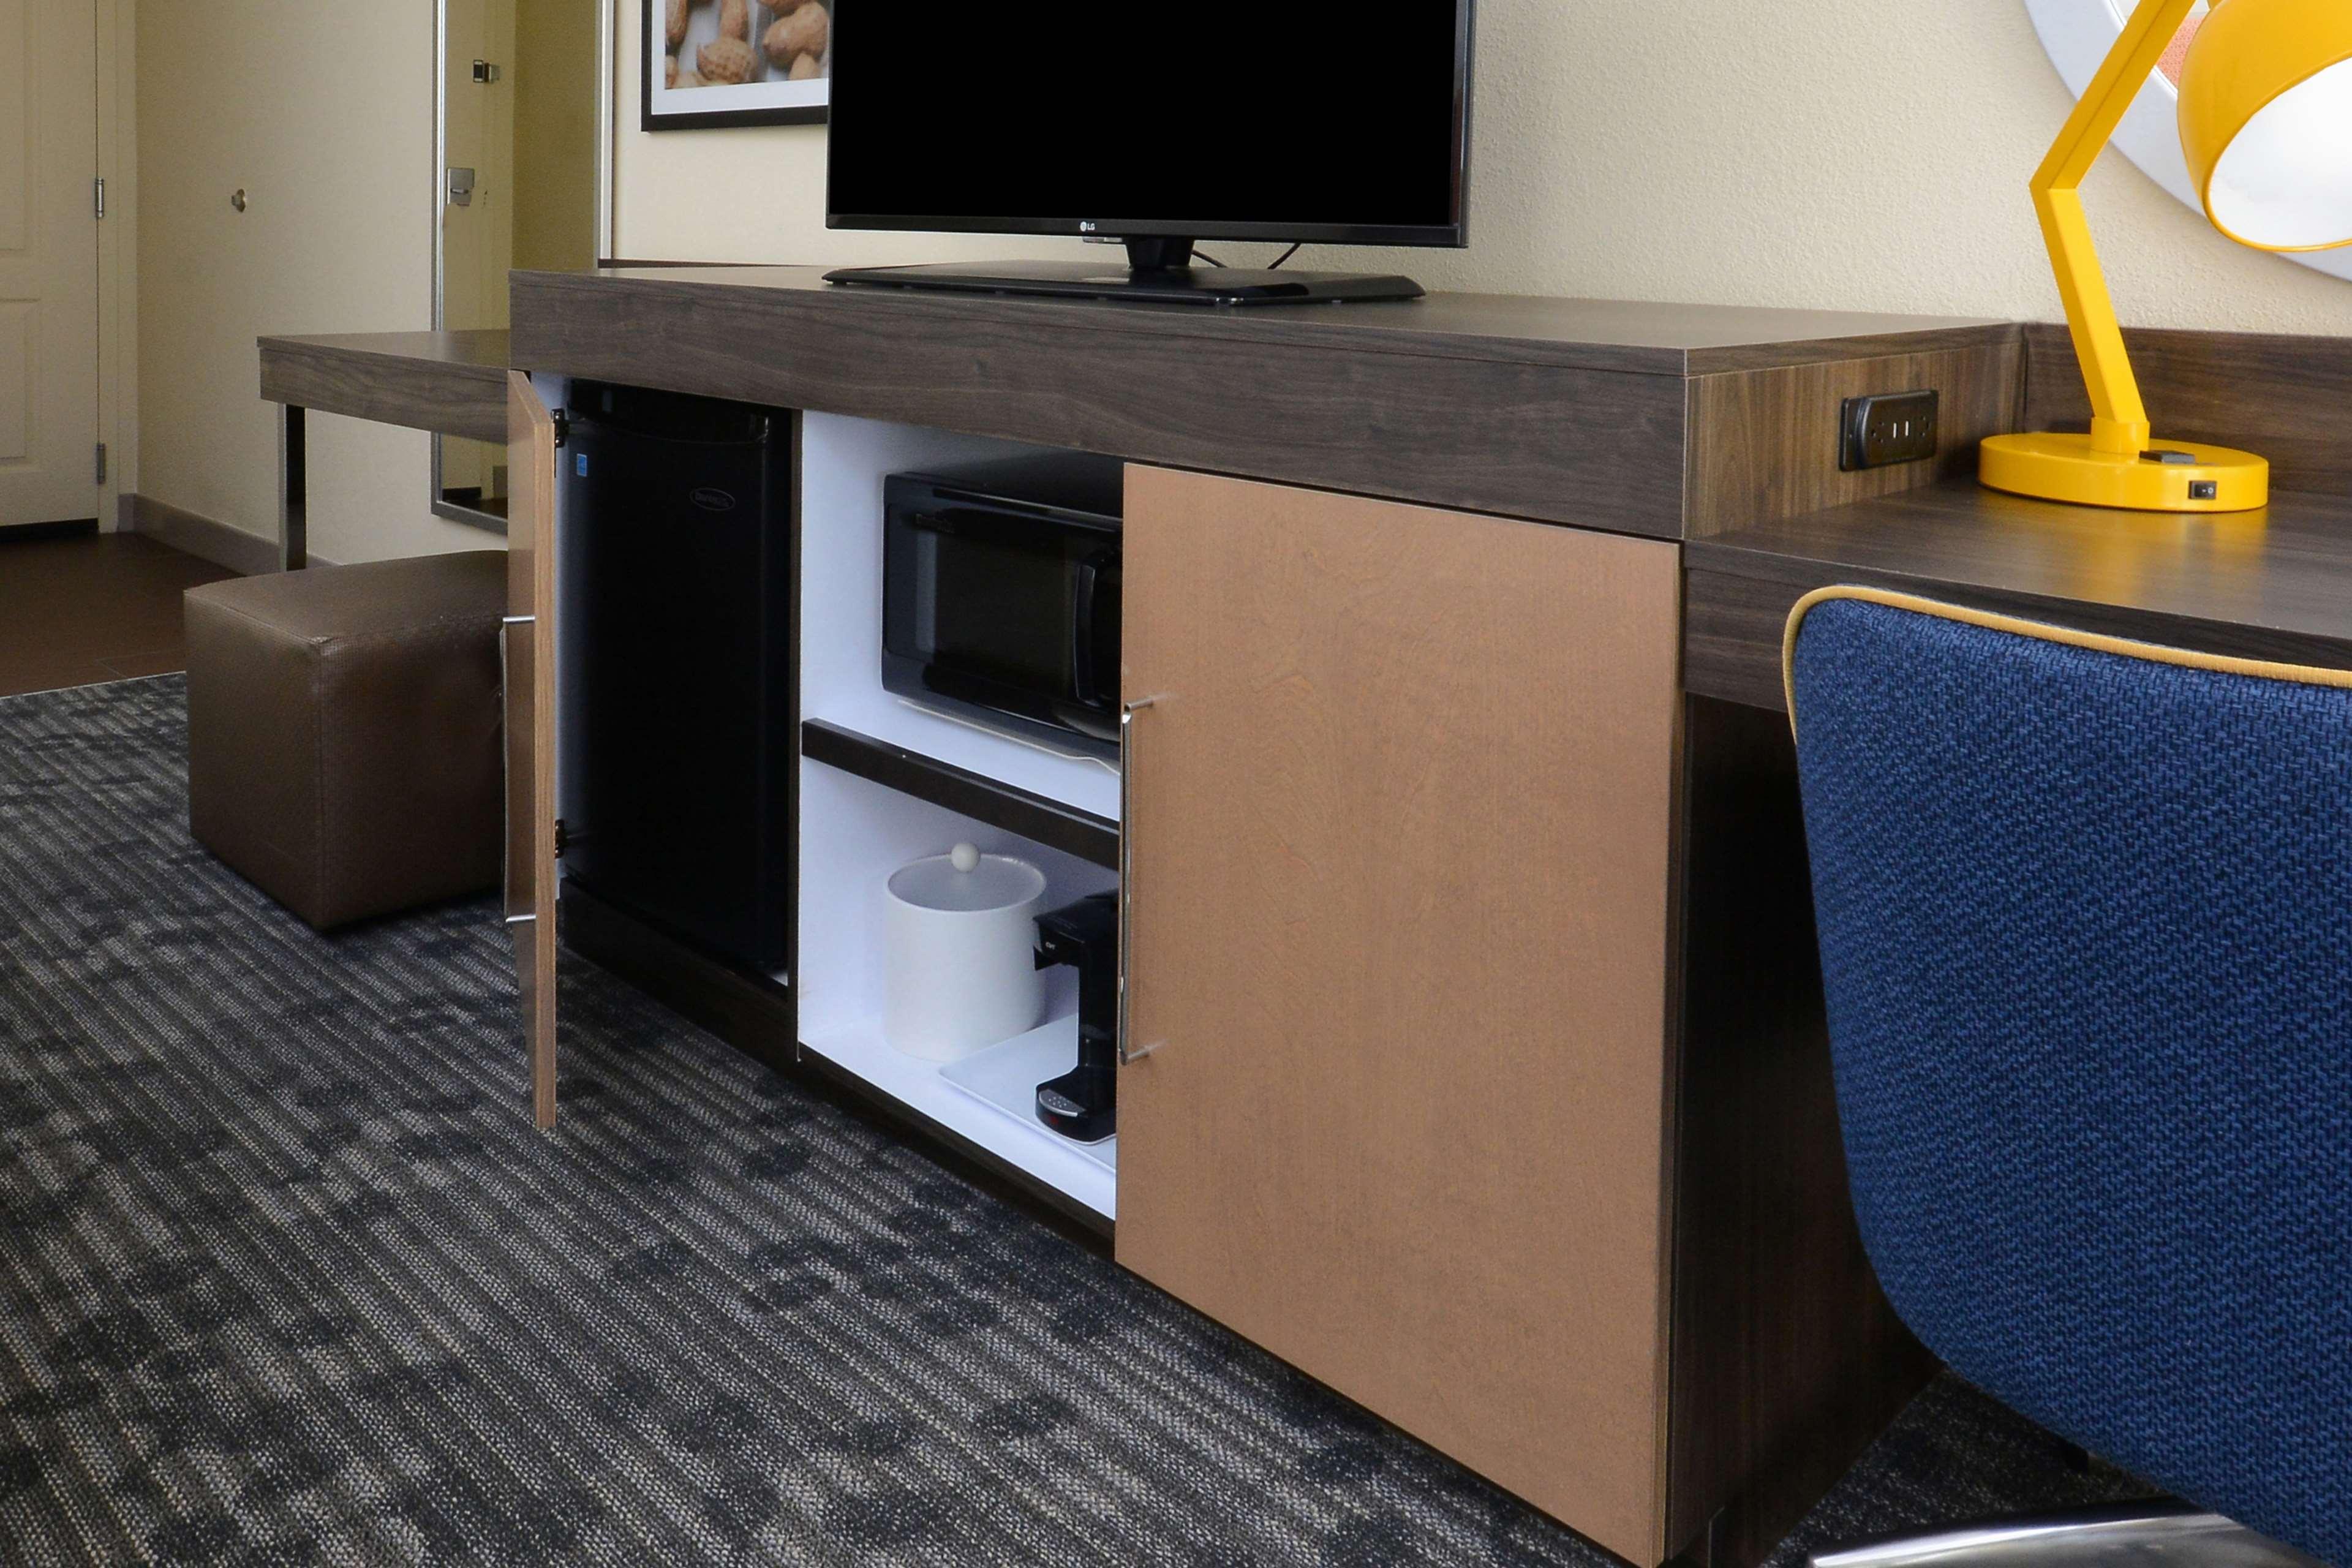 Hampton Inn & Suites Greenville/Spartanburg I-85 image 27